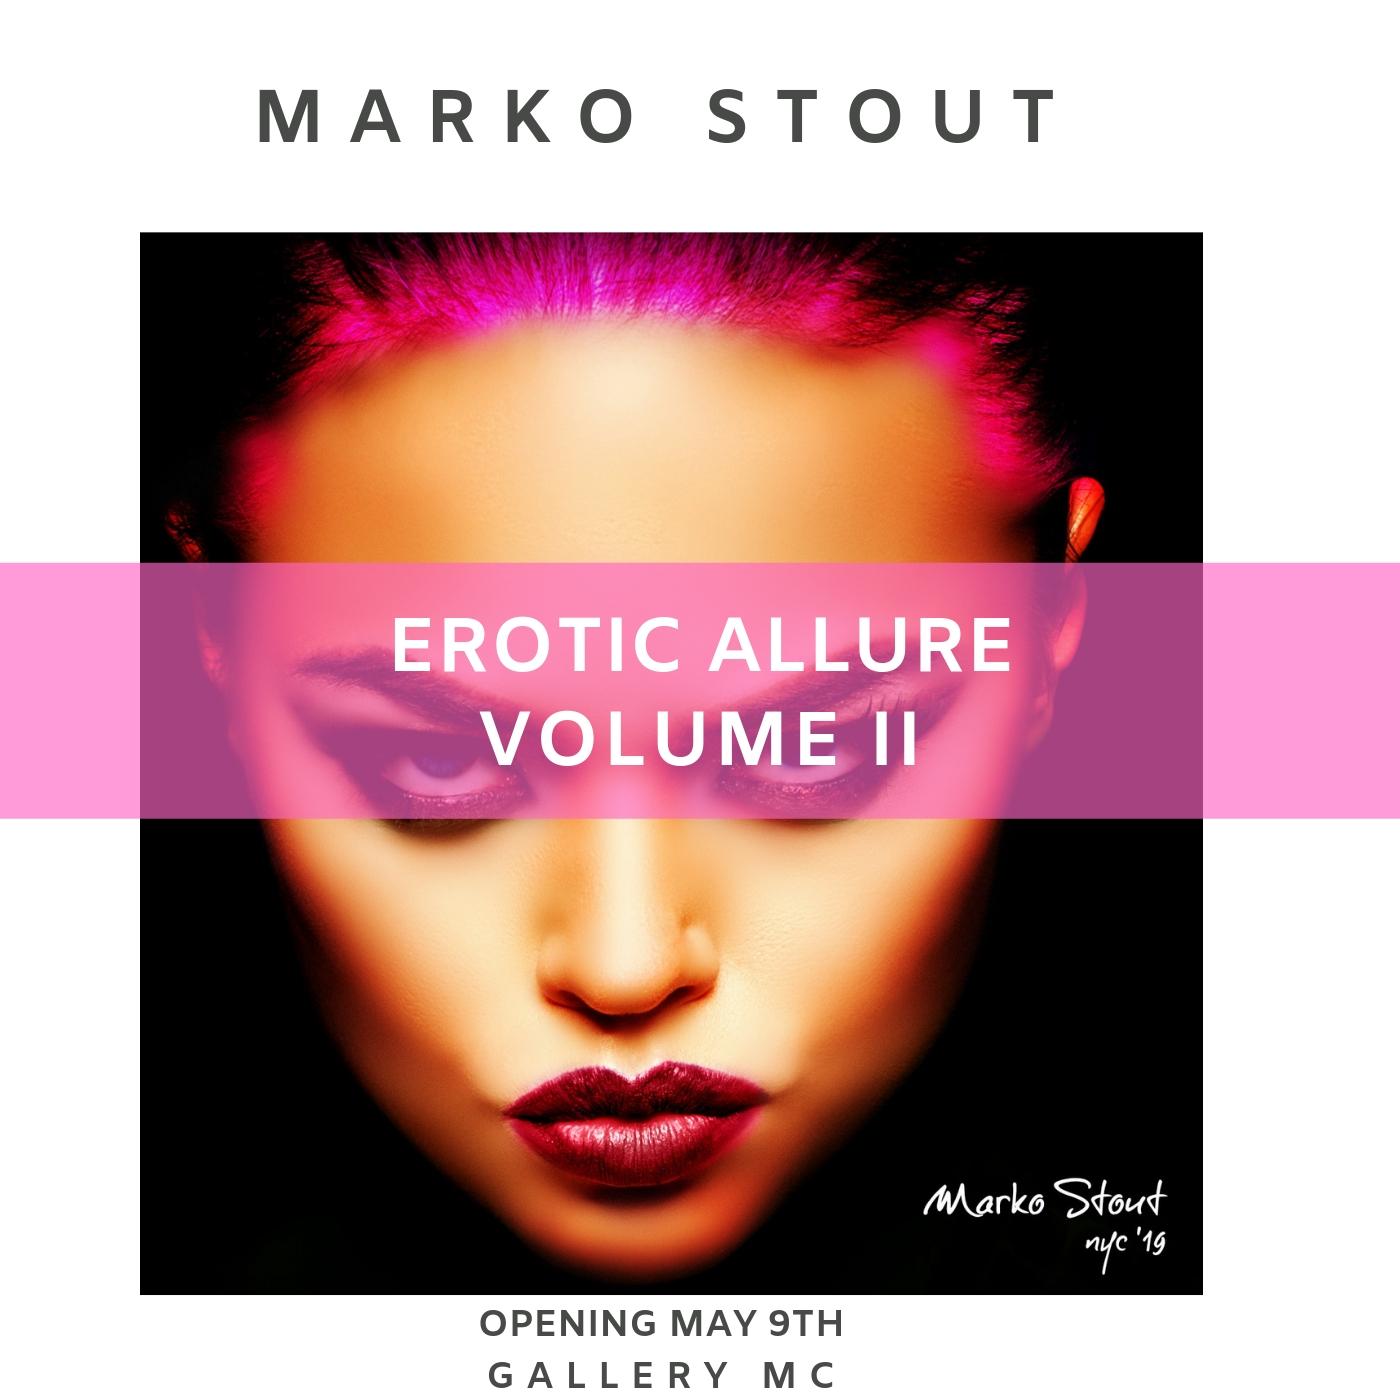 #markostout erotic allure